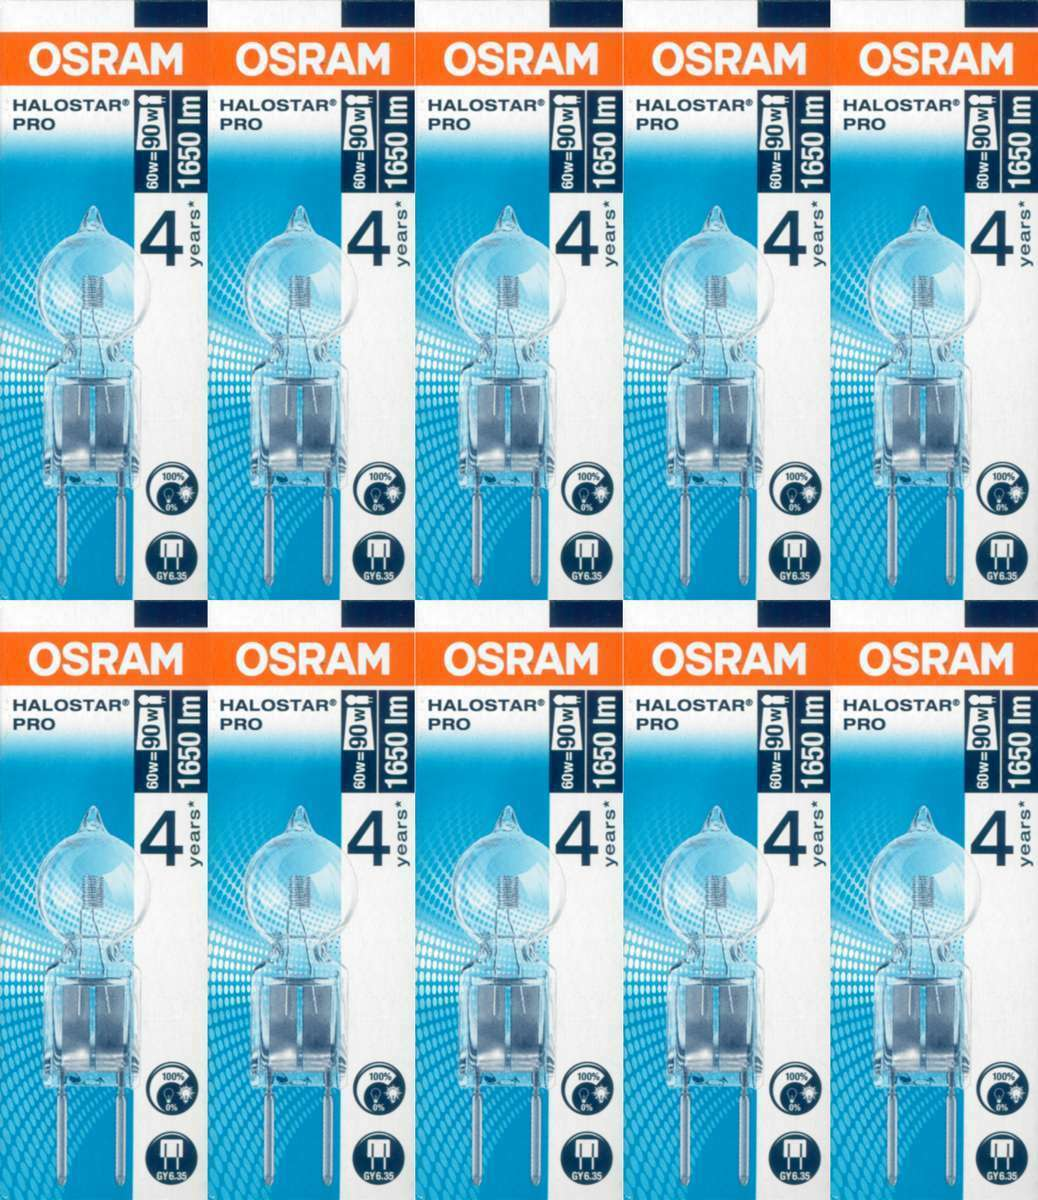 10 X Osram Lámpara de Zócalo Fino Halostar pro 64447 GY6,35 12V 60W Halógeno EEK